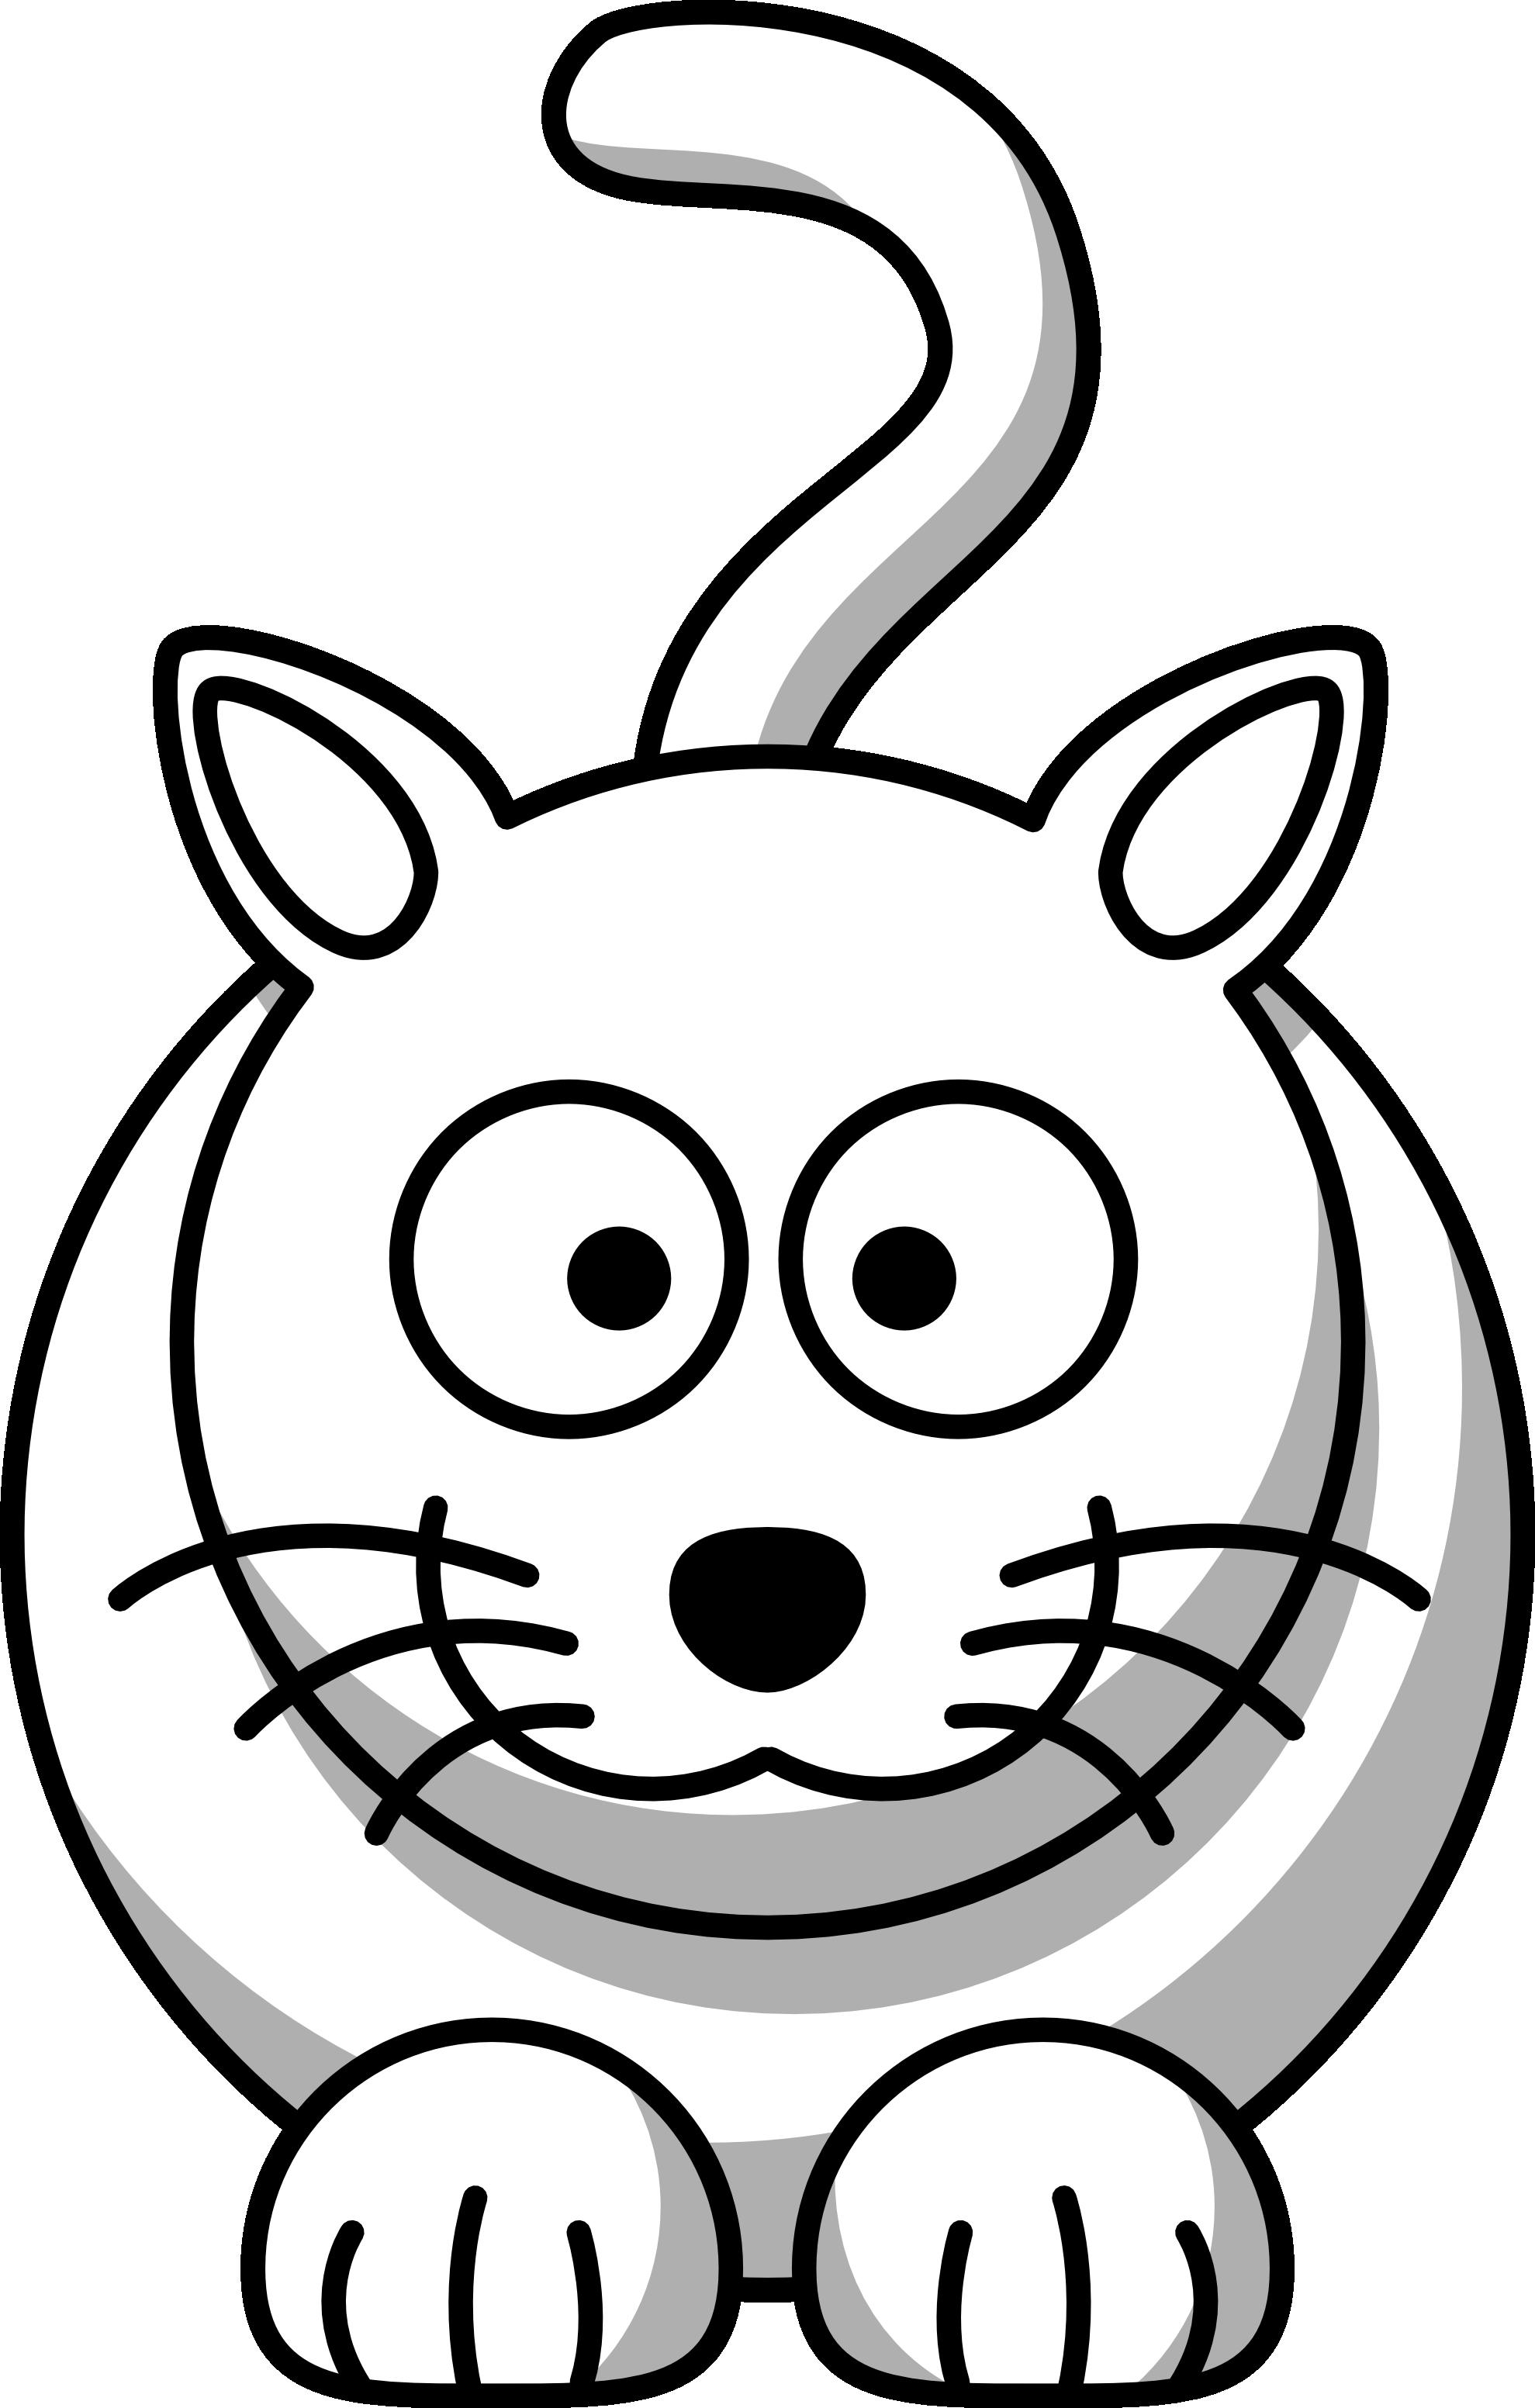 Clip Art Animals Black And White - Cliparts.co